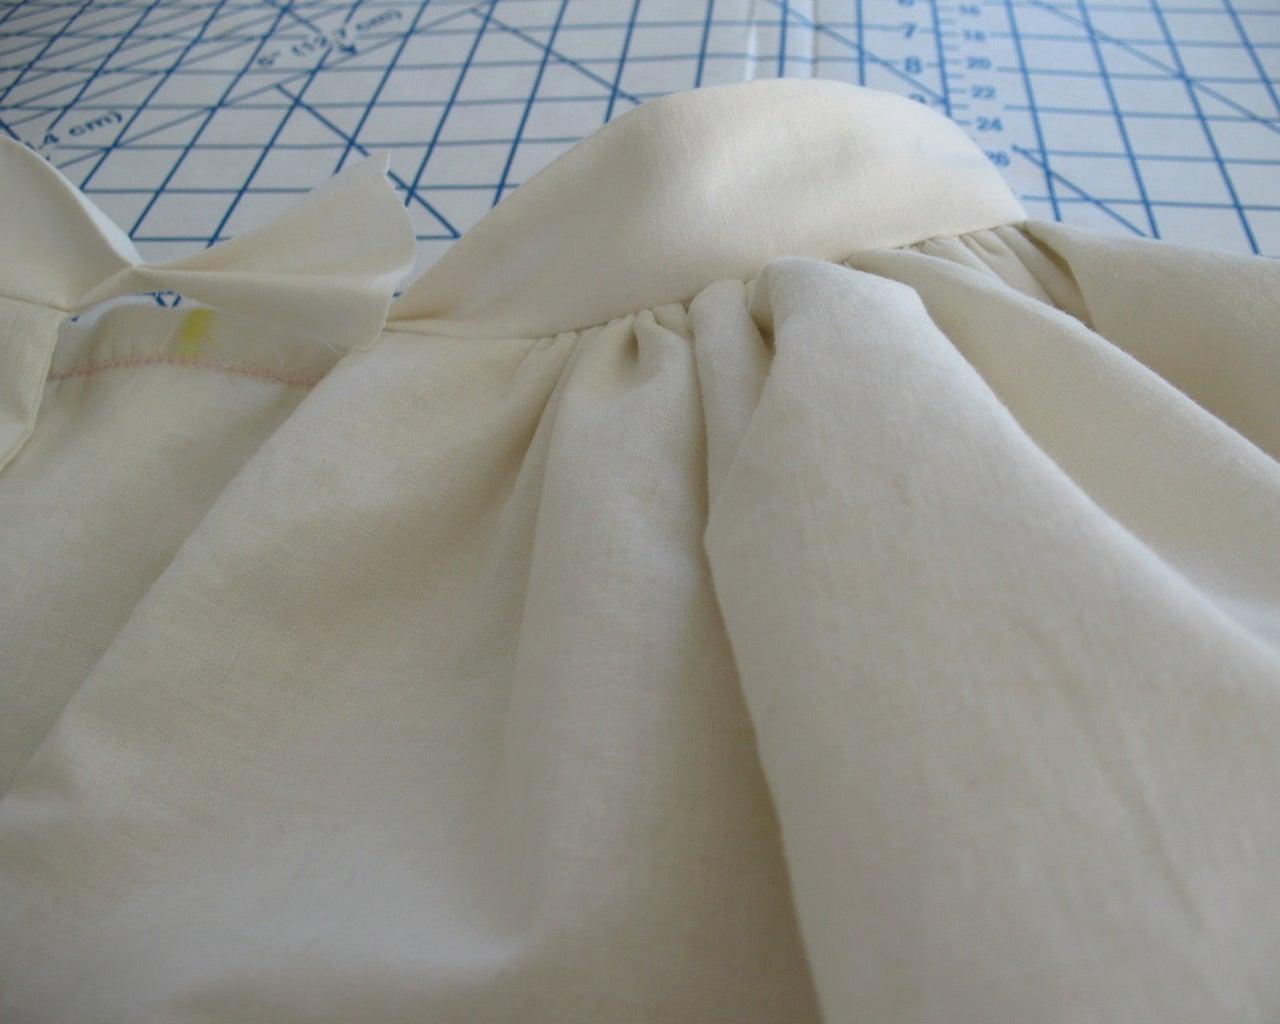 Join Waistband to Skirt